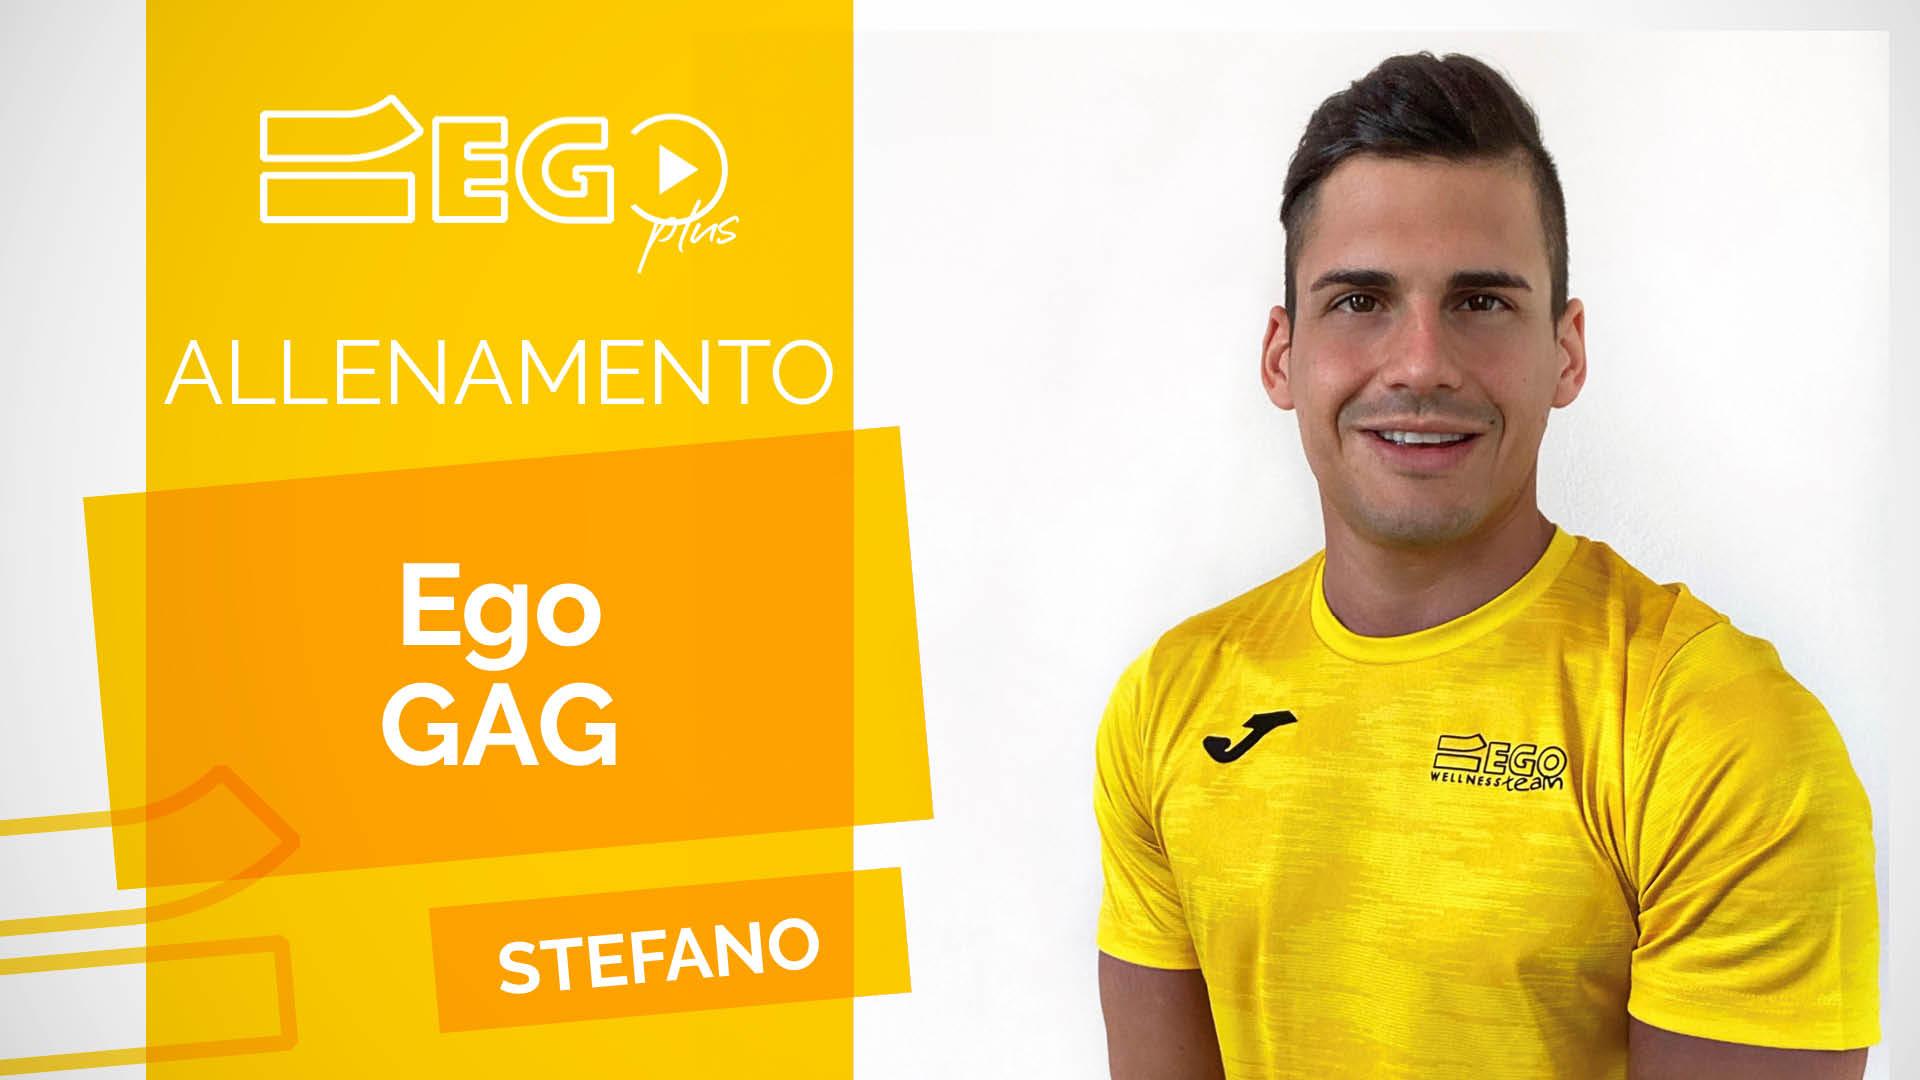 Ego-Gag-Stefano